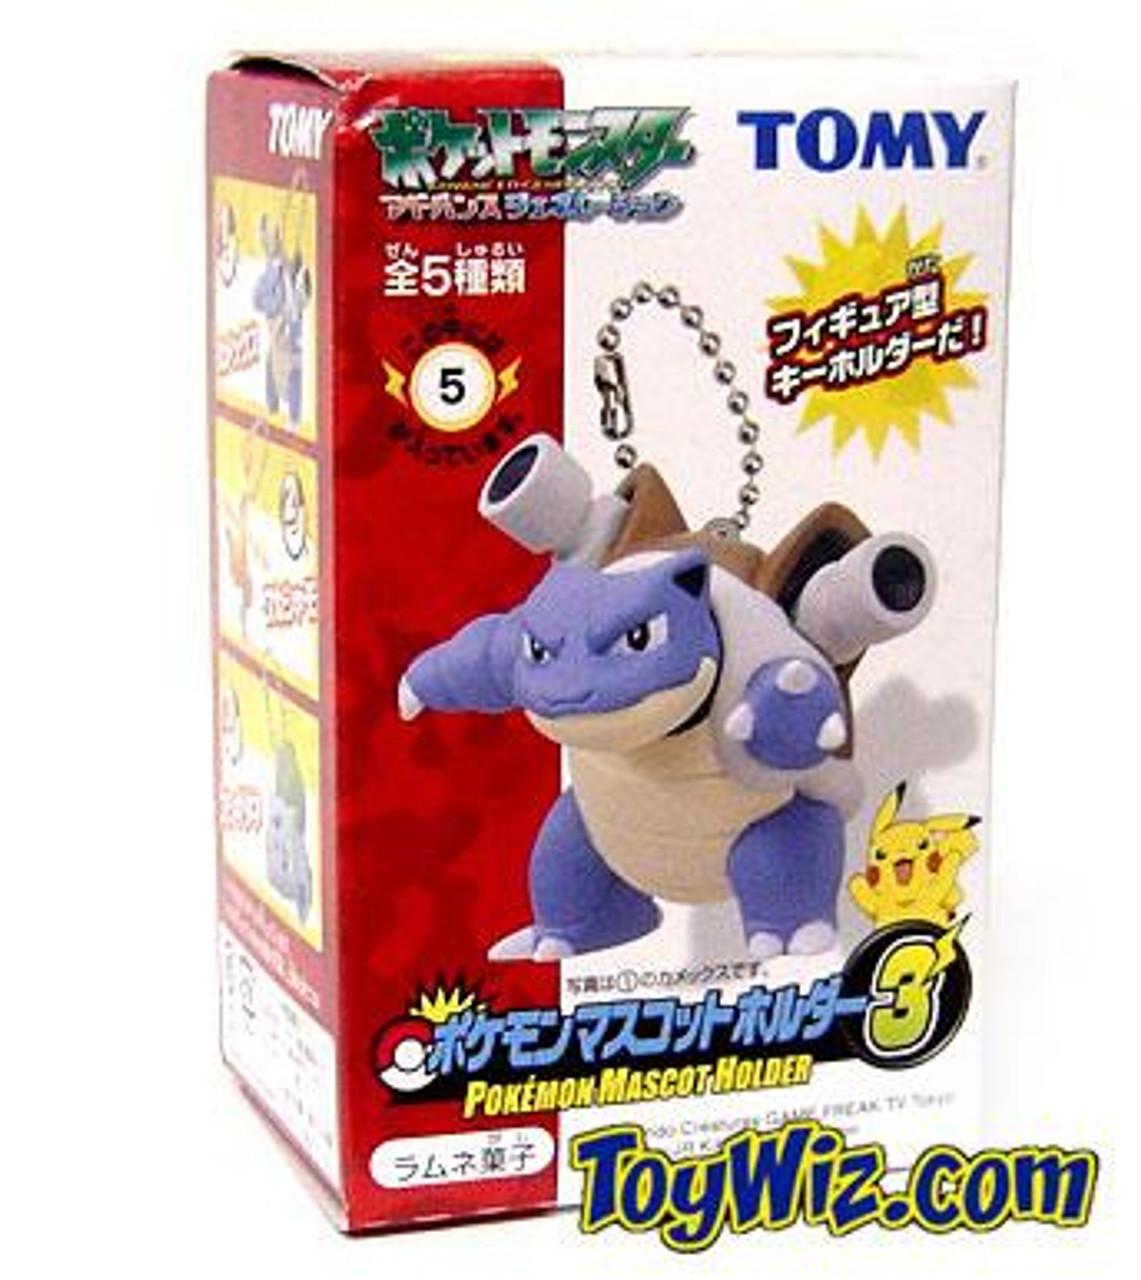 Pokemon Mascot Holder Blastoise Keychain #5